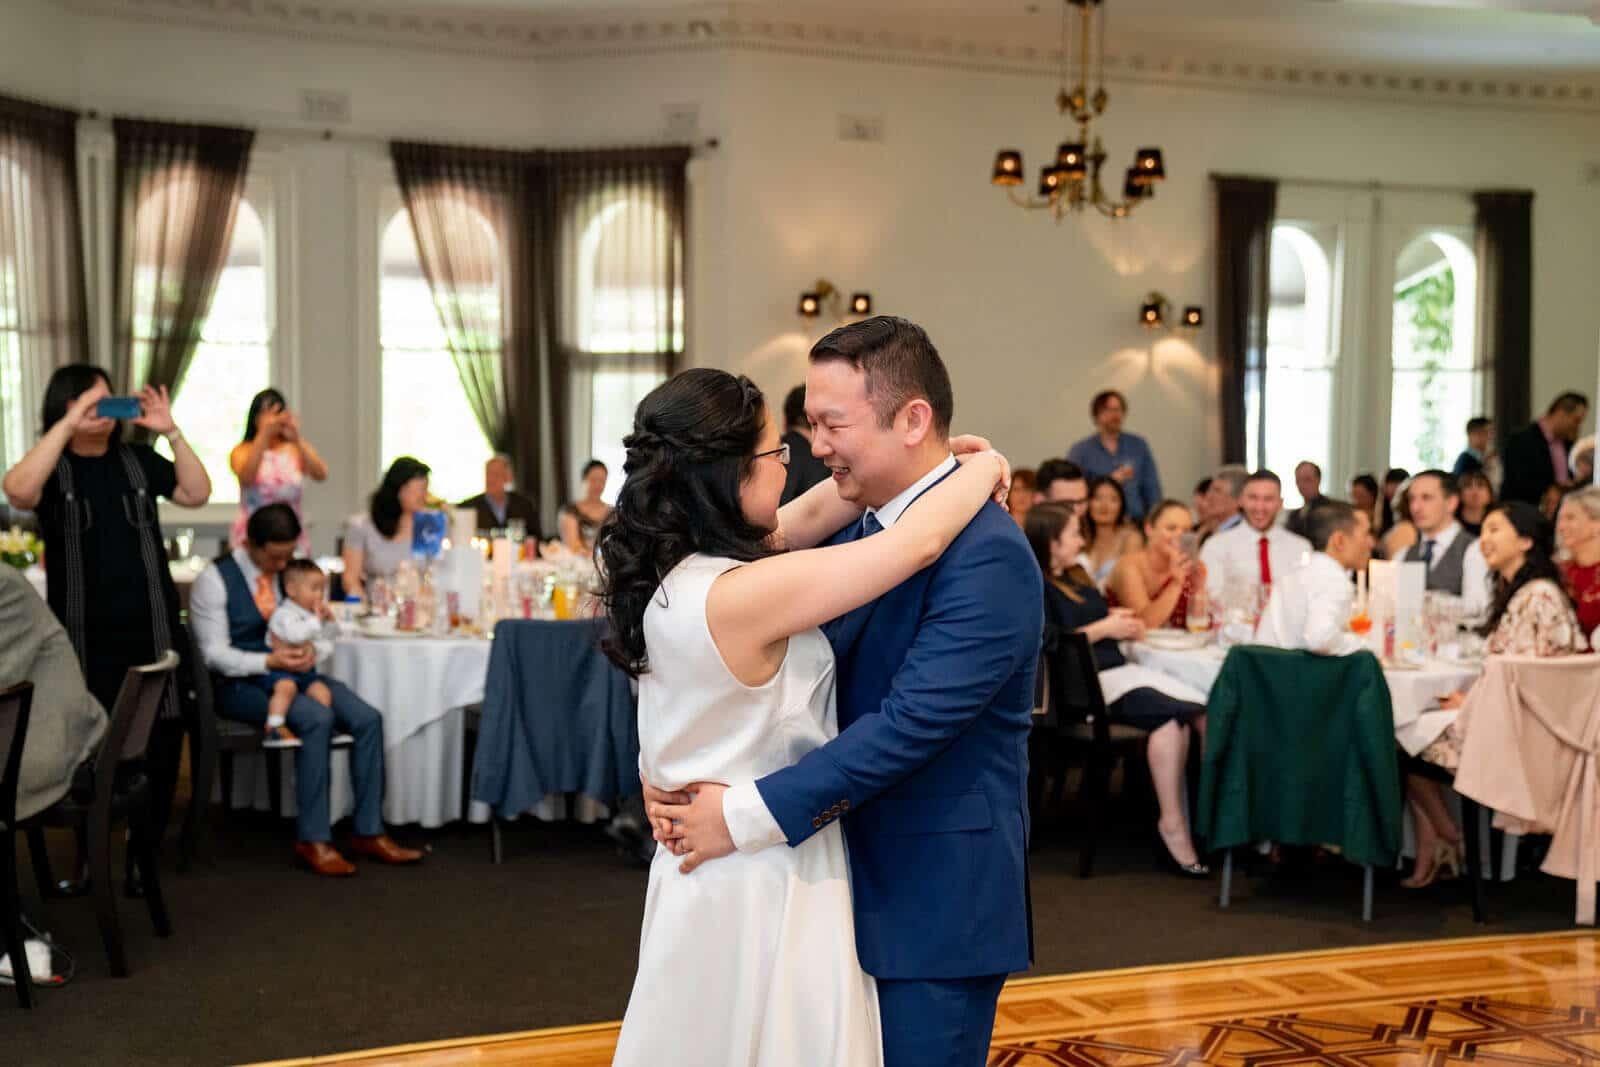 Quat Quatta | Wedding Reception First Dance